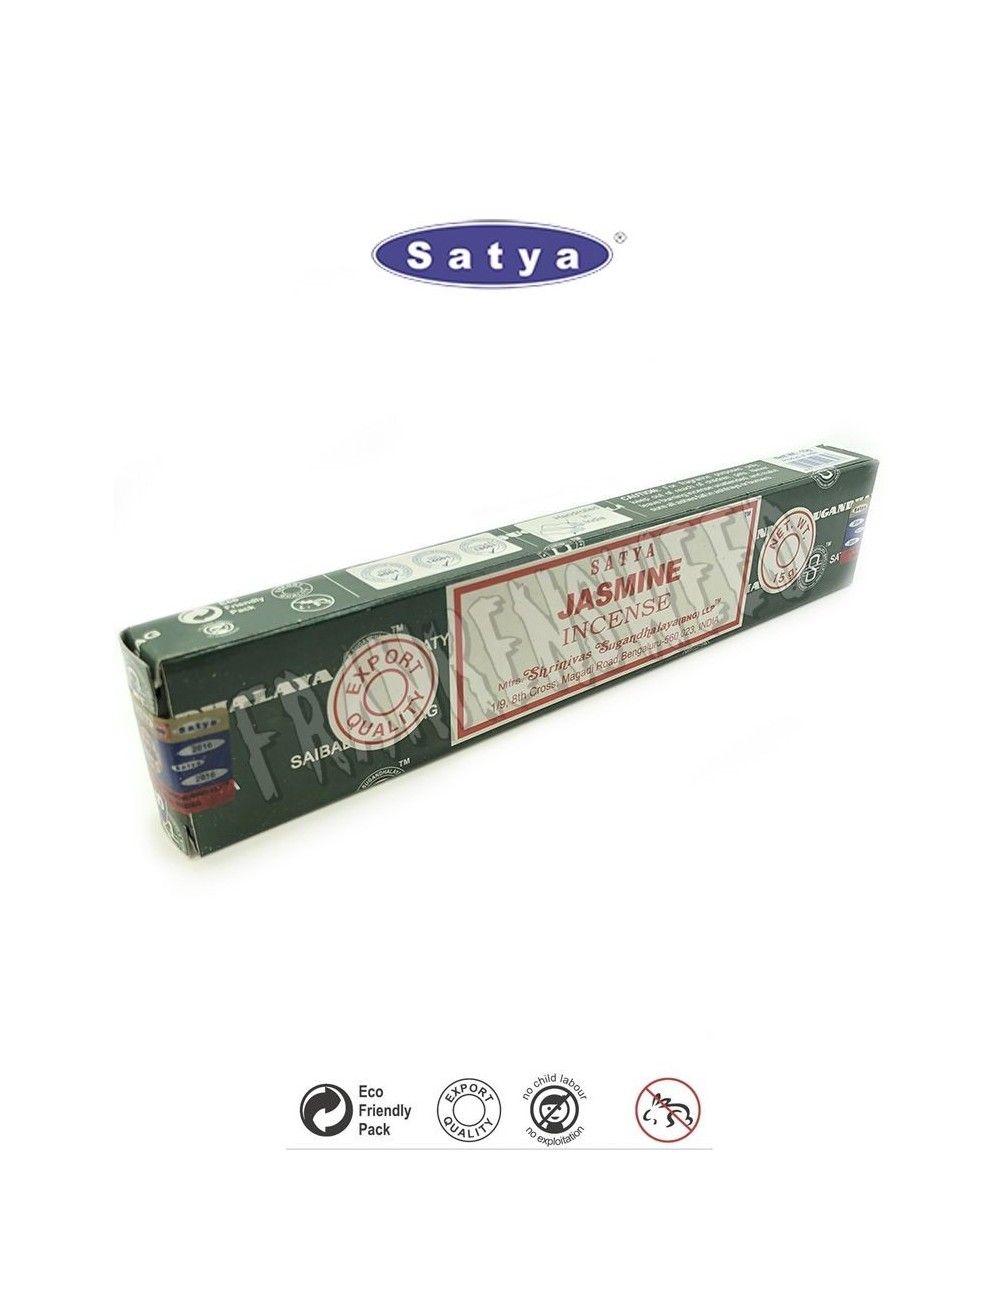 Jasmine - Satya Sai Baba - Incense Sticks